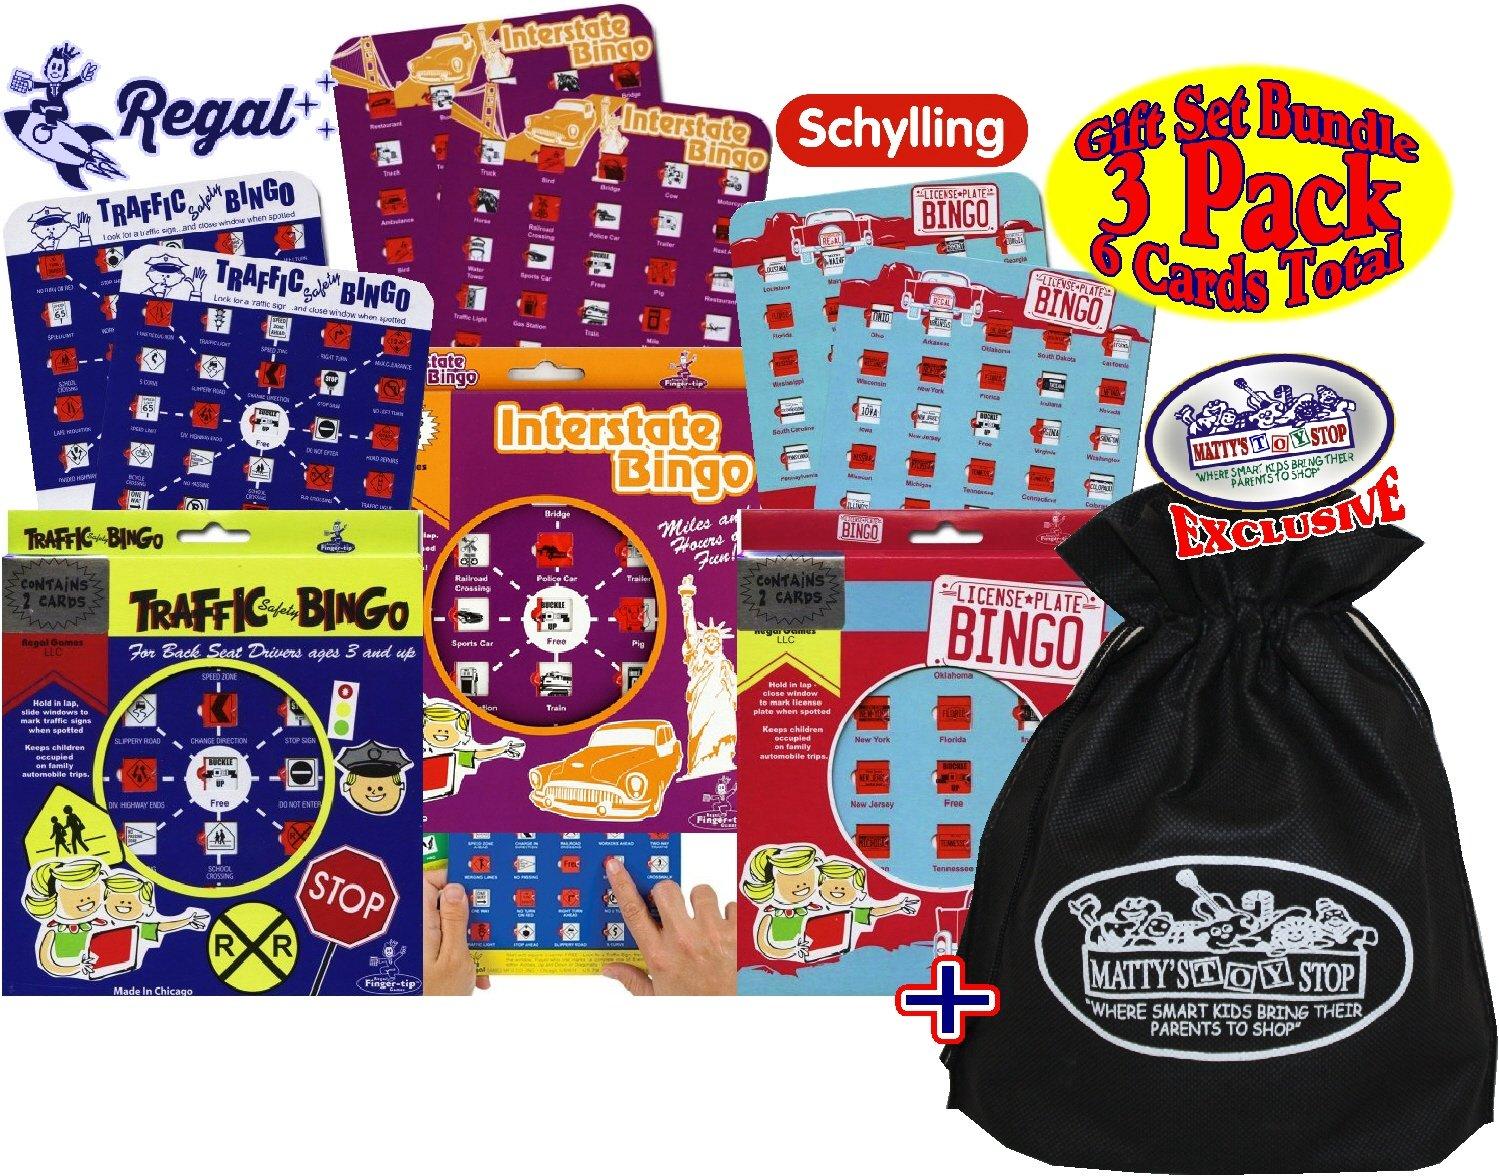 Regal Games Classic Travel Bingo Cards Traffic Safety Bingo, License Plate Bingo & Interstate Bingo Gift Set Bundle with Exclusive Matty's Toy Stop Storage Bag - 3 Pack (6 Bingo Cards Total)